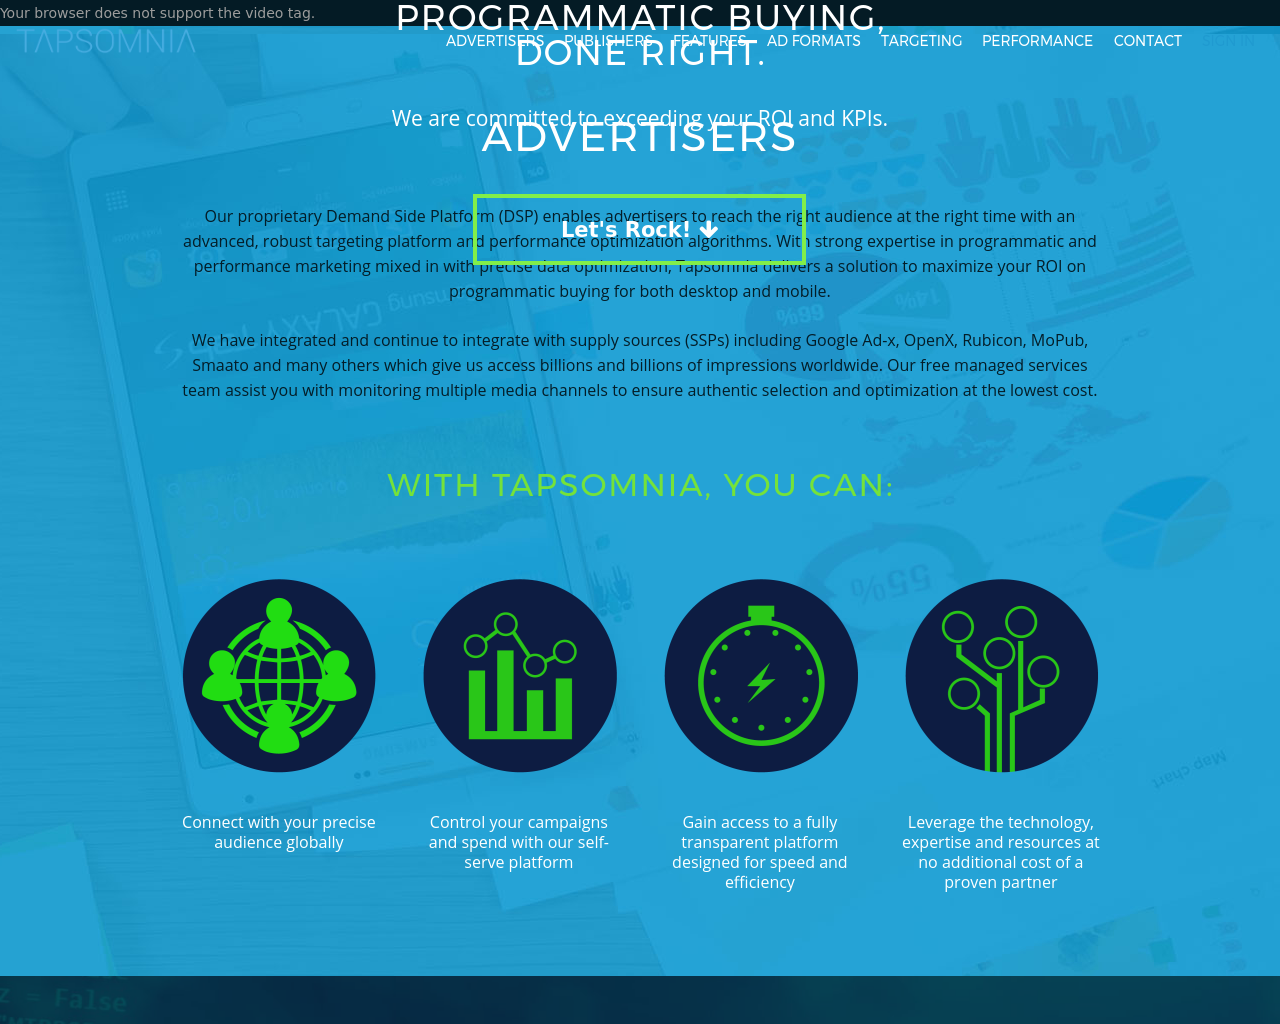 Tapsomnia-Advertising-Reviews-Pricing